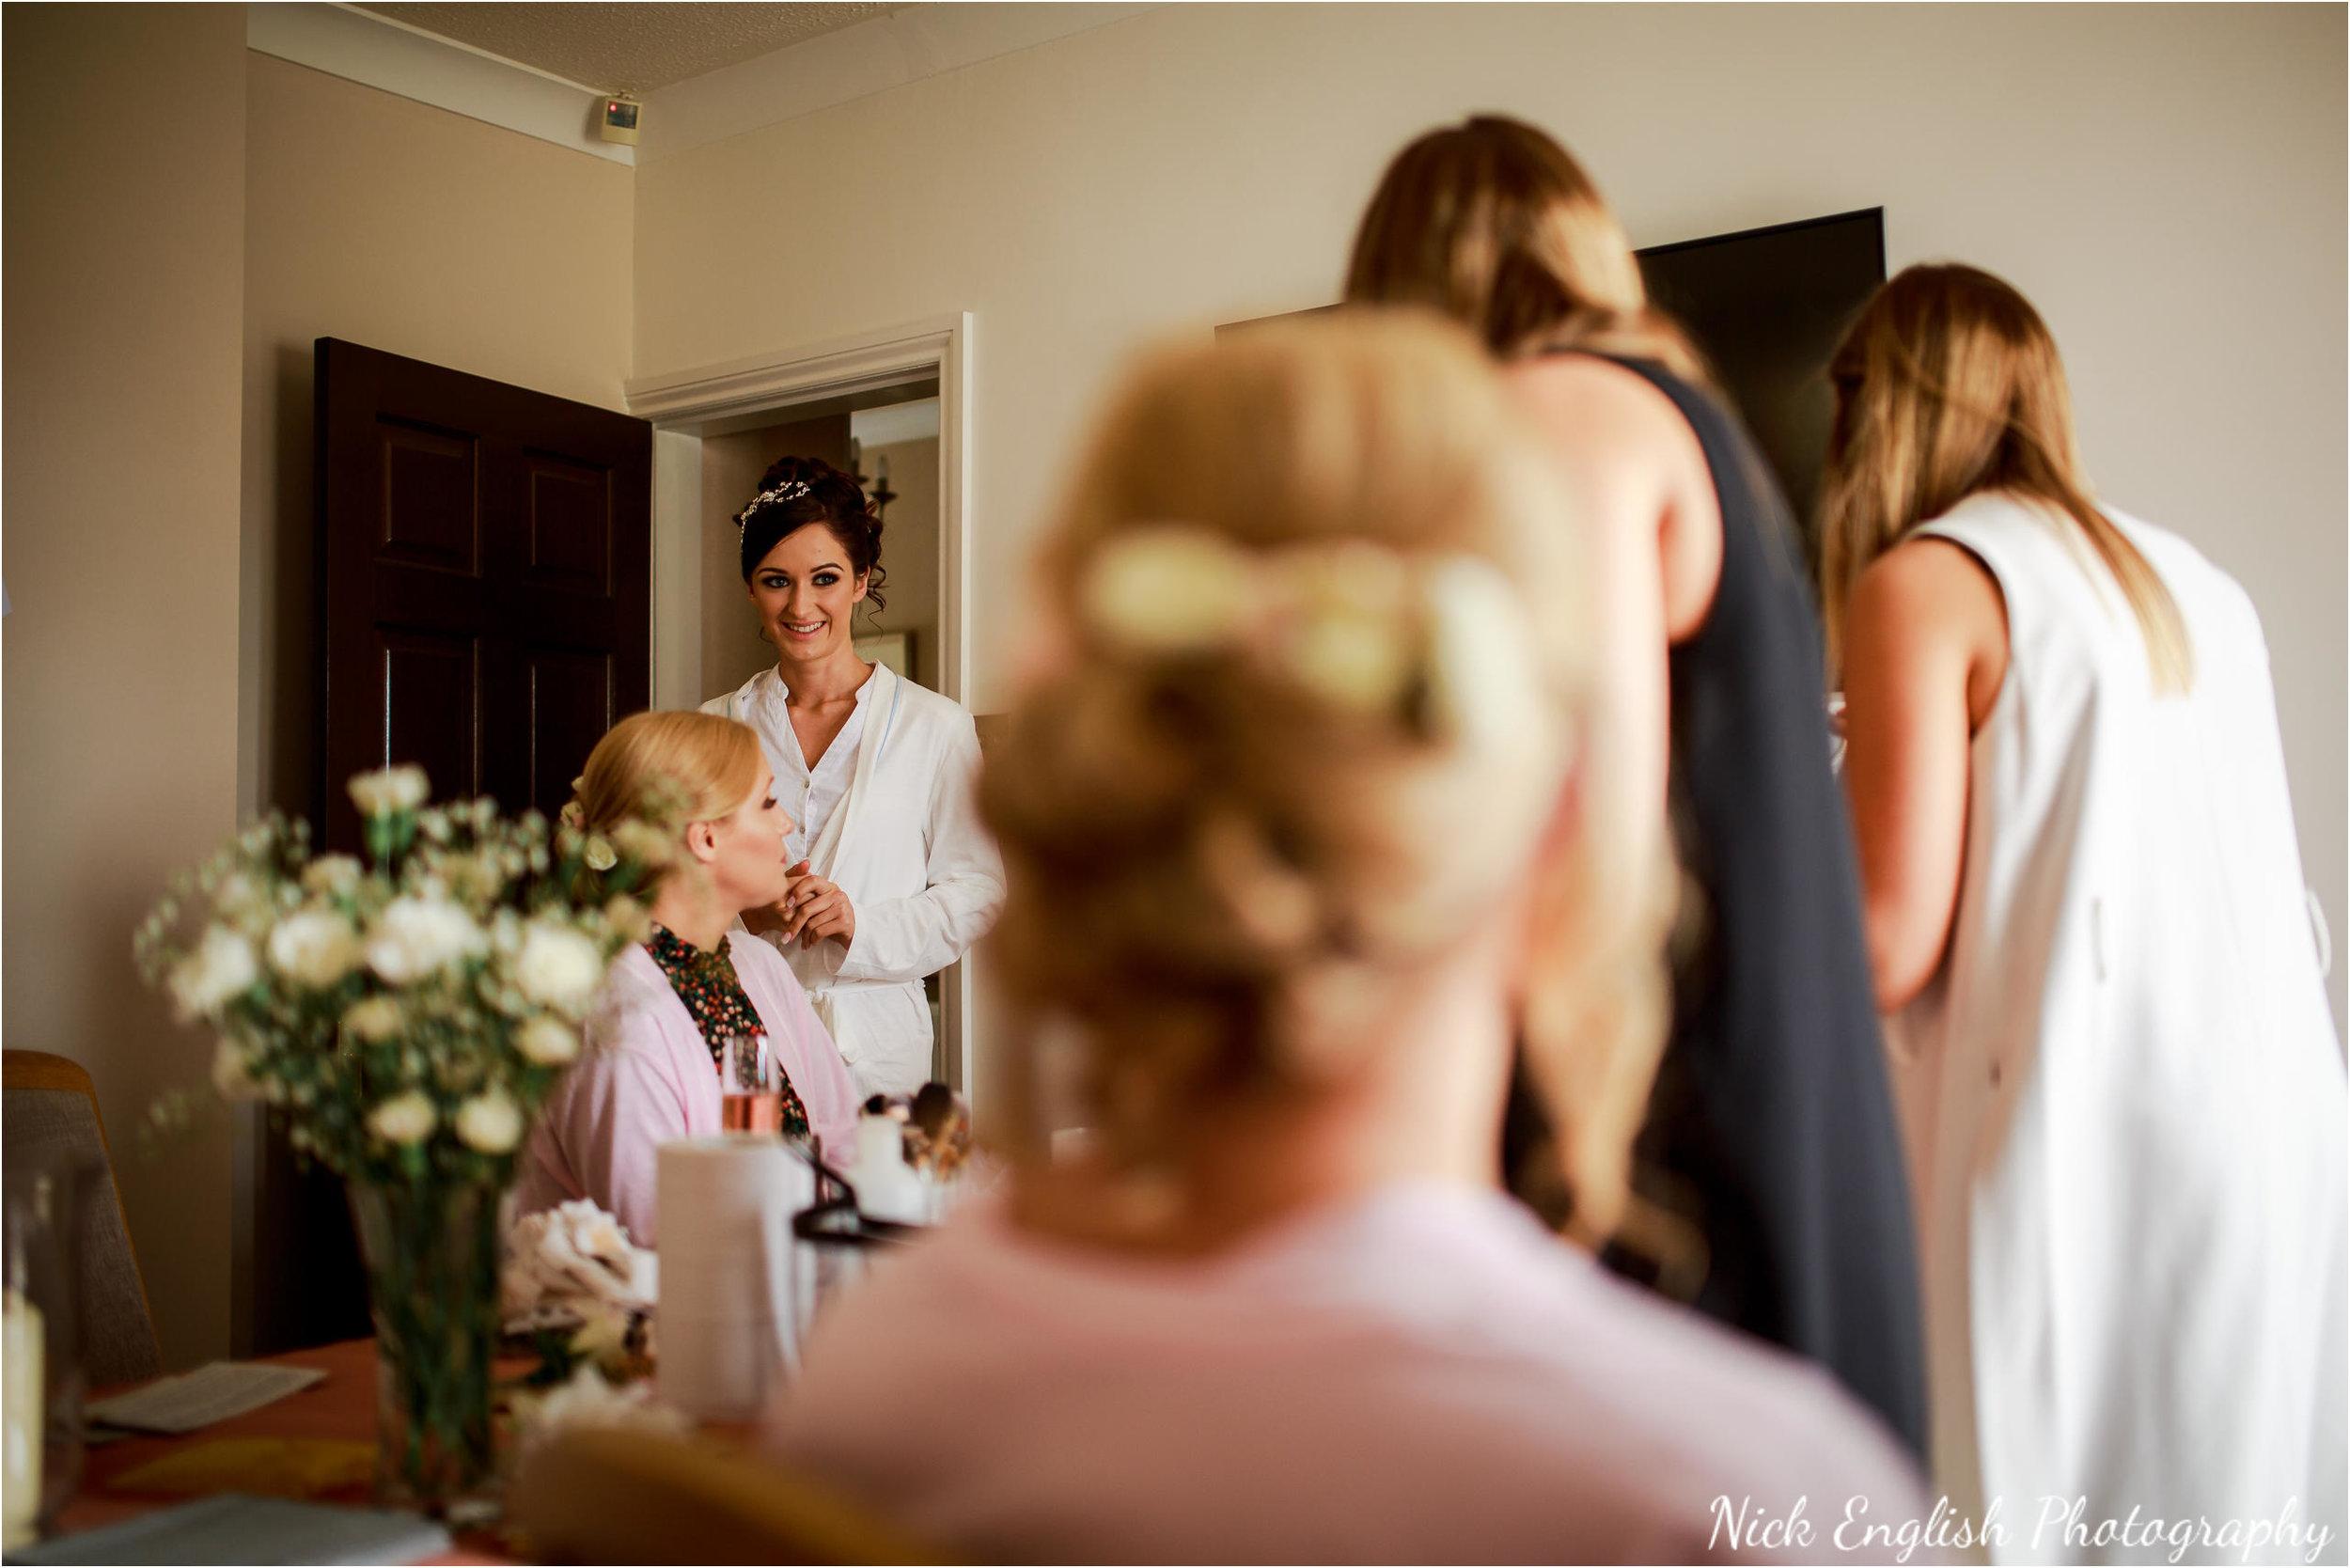 Emily David Wedding Photographs at Barton Grange Preston by Nick English Photography 28jpg.jpeg